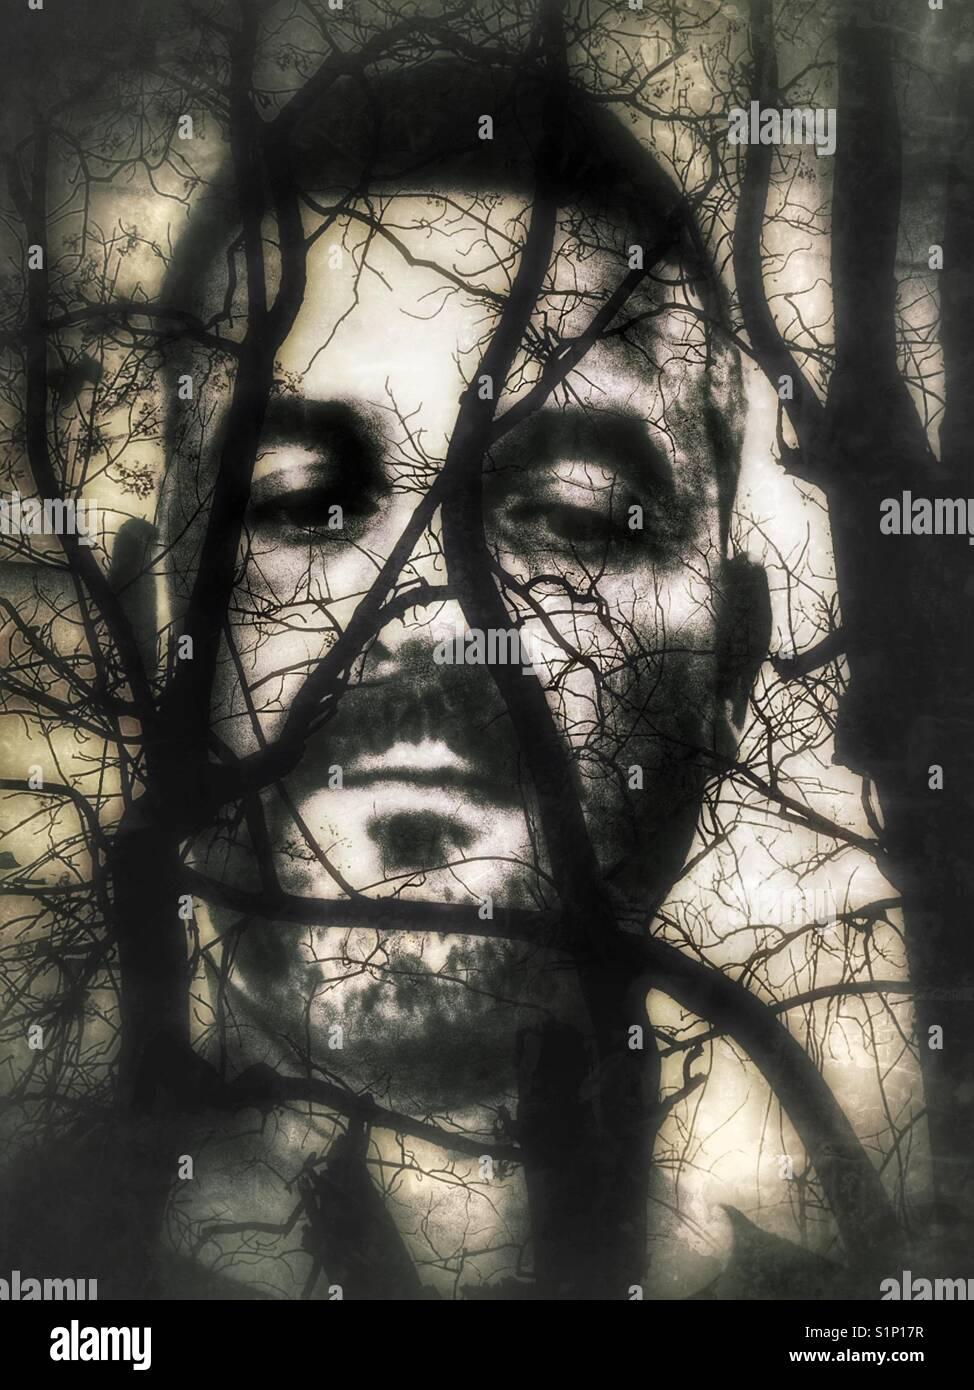 Multi exposición conceptual de un adulto masculino rostro detrás de las nudosas ramas de árbol. Imagen De Stock